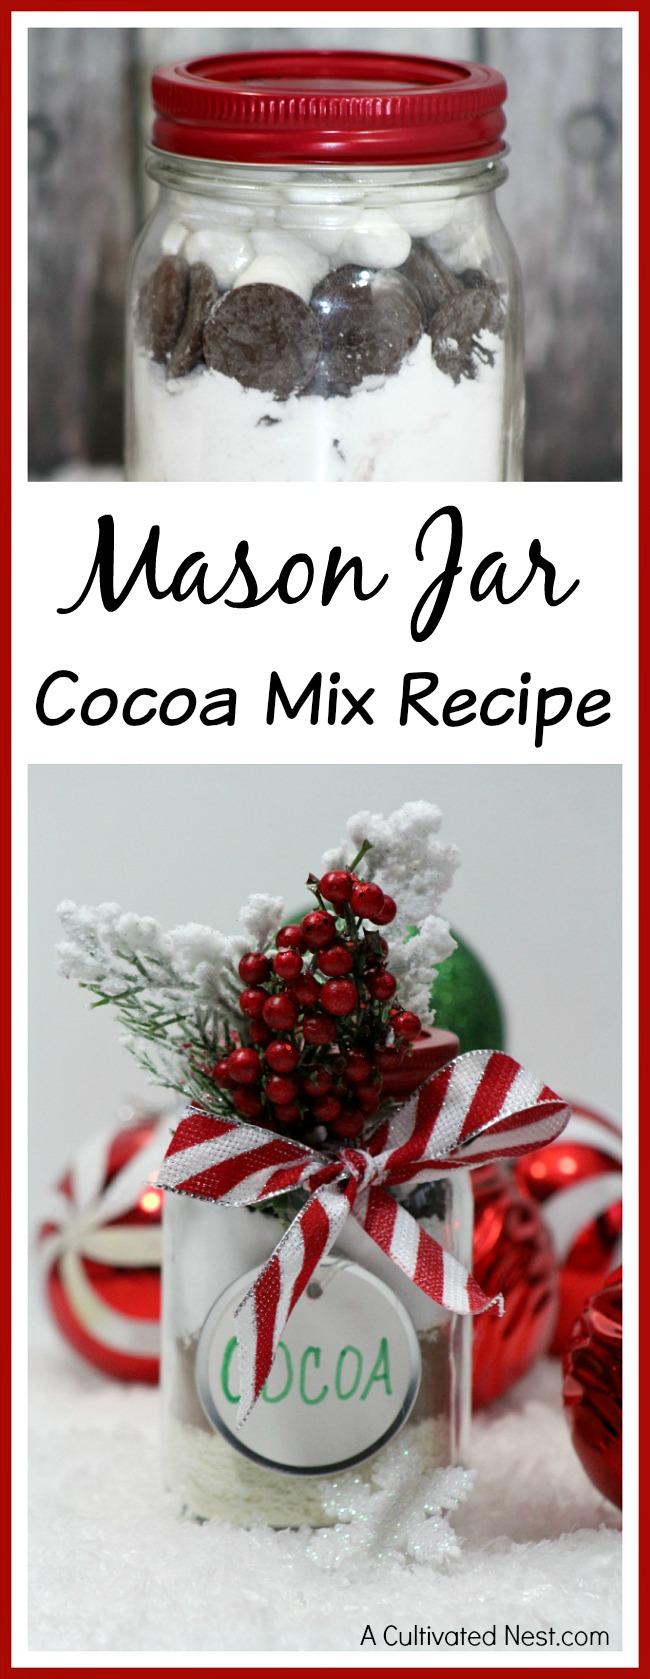 Mason Jar Cocoa Mix Recipe - this hot chocolate makes the perfect festive homemade mason jar gift!